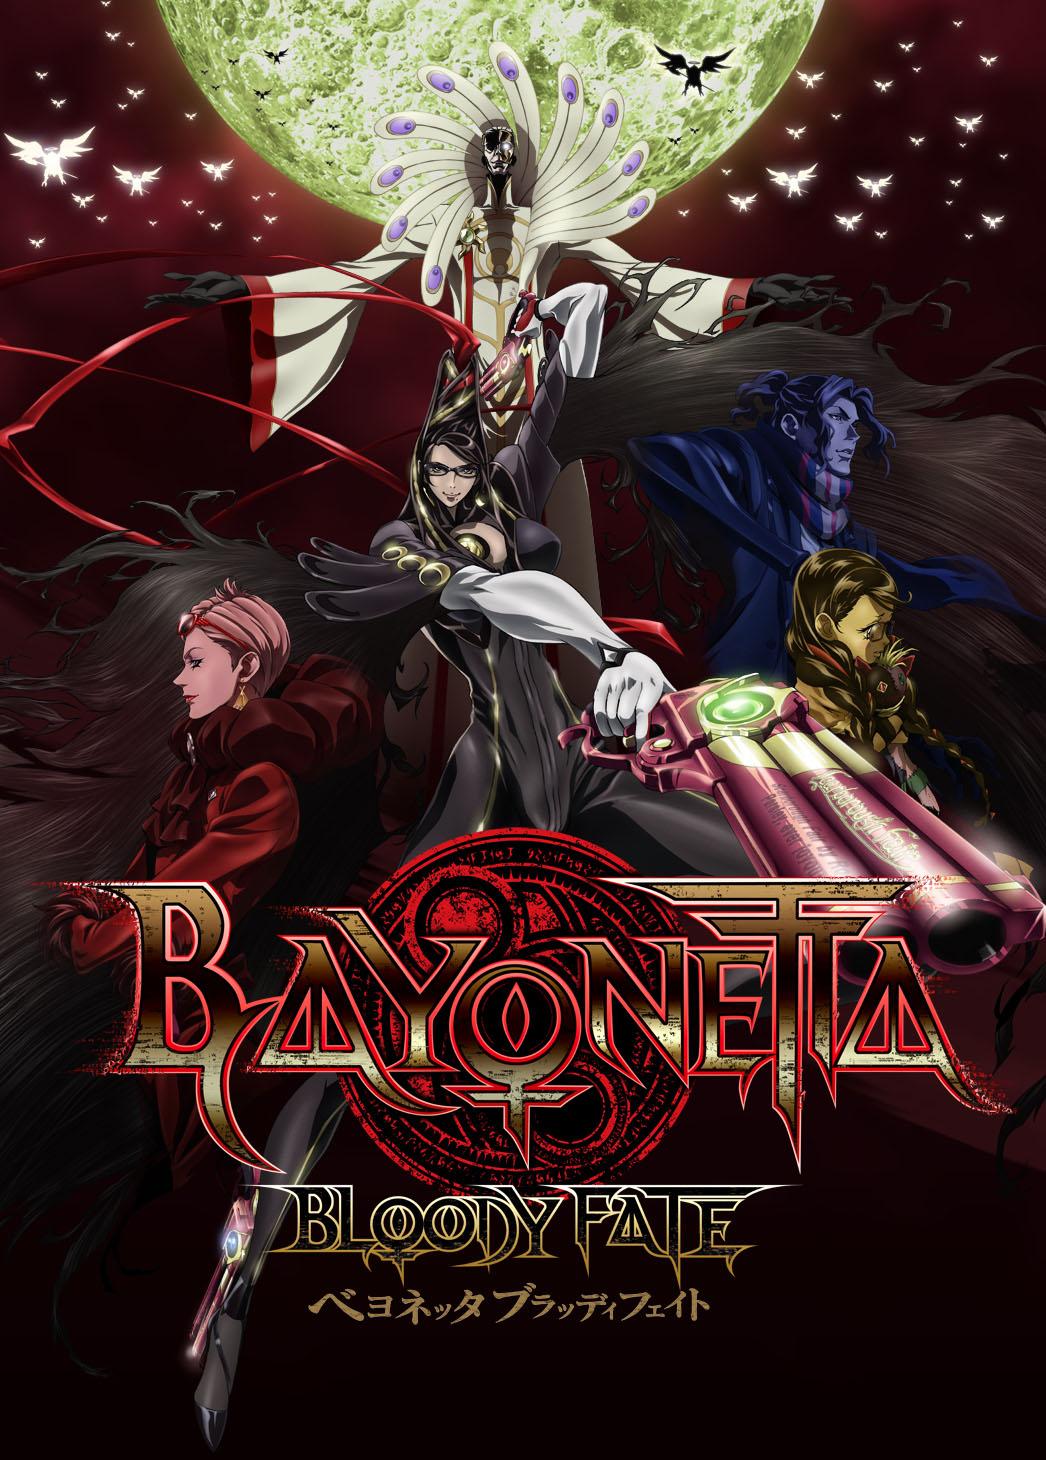 >Bayonetta - Bloody Fate บาโยเน็ตต้า บลัดดีเฟท (Movie) พากย์ไทย ซับไทย